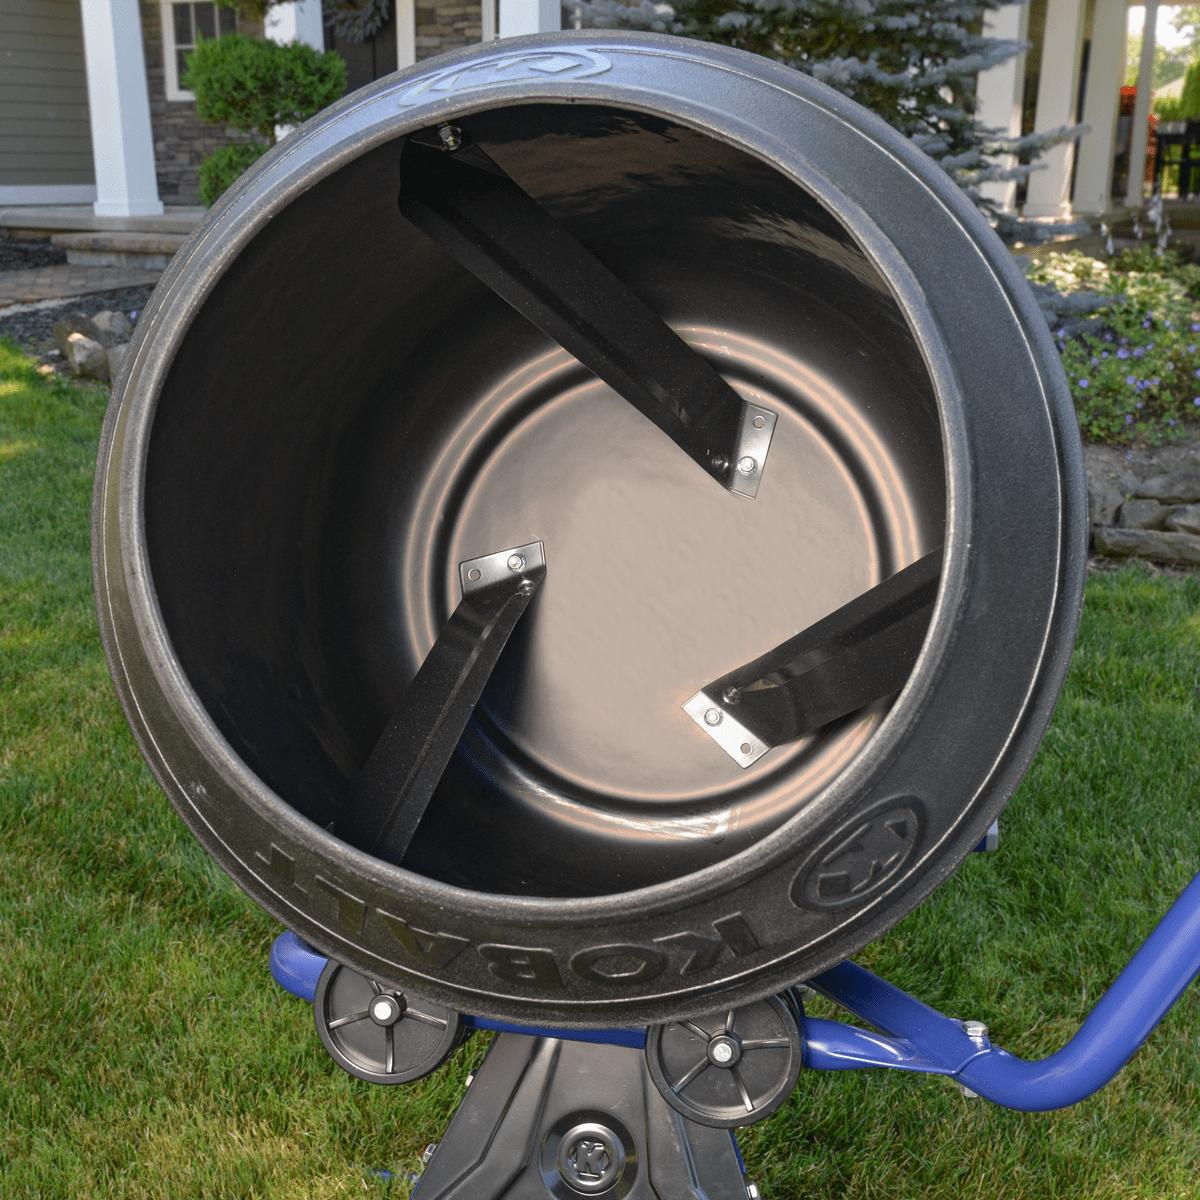 Kobalt 4-cu ft 0 5-HP Cement Mixer at Lowes com